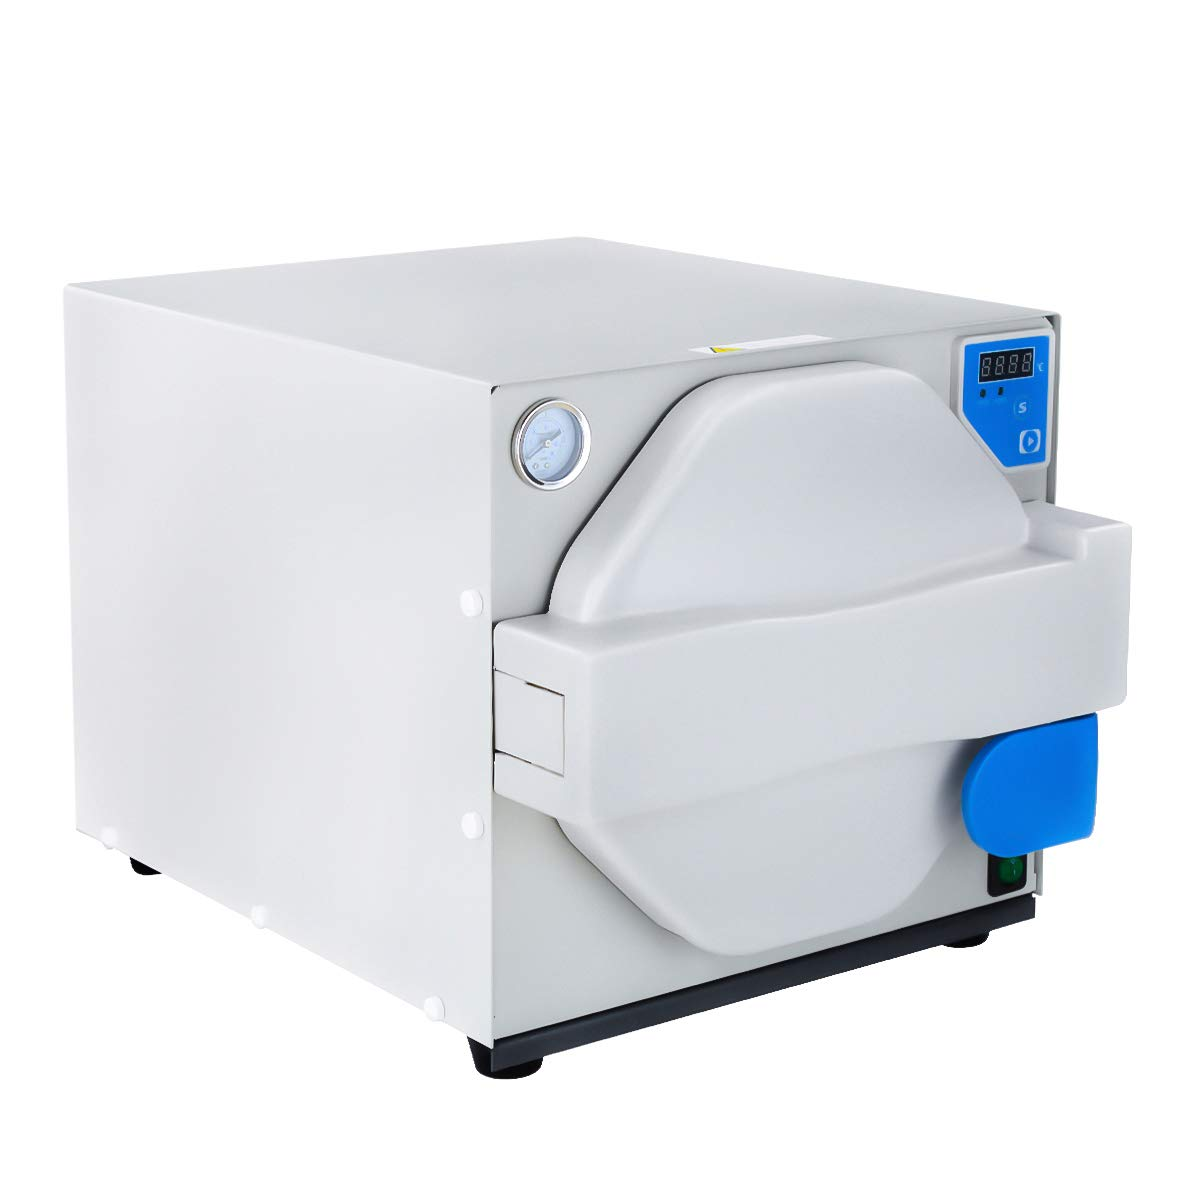 SOHOME 18L MINI320 Digital Display Autoclave Steam Lab Machine by SoHome (Image #6)